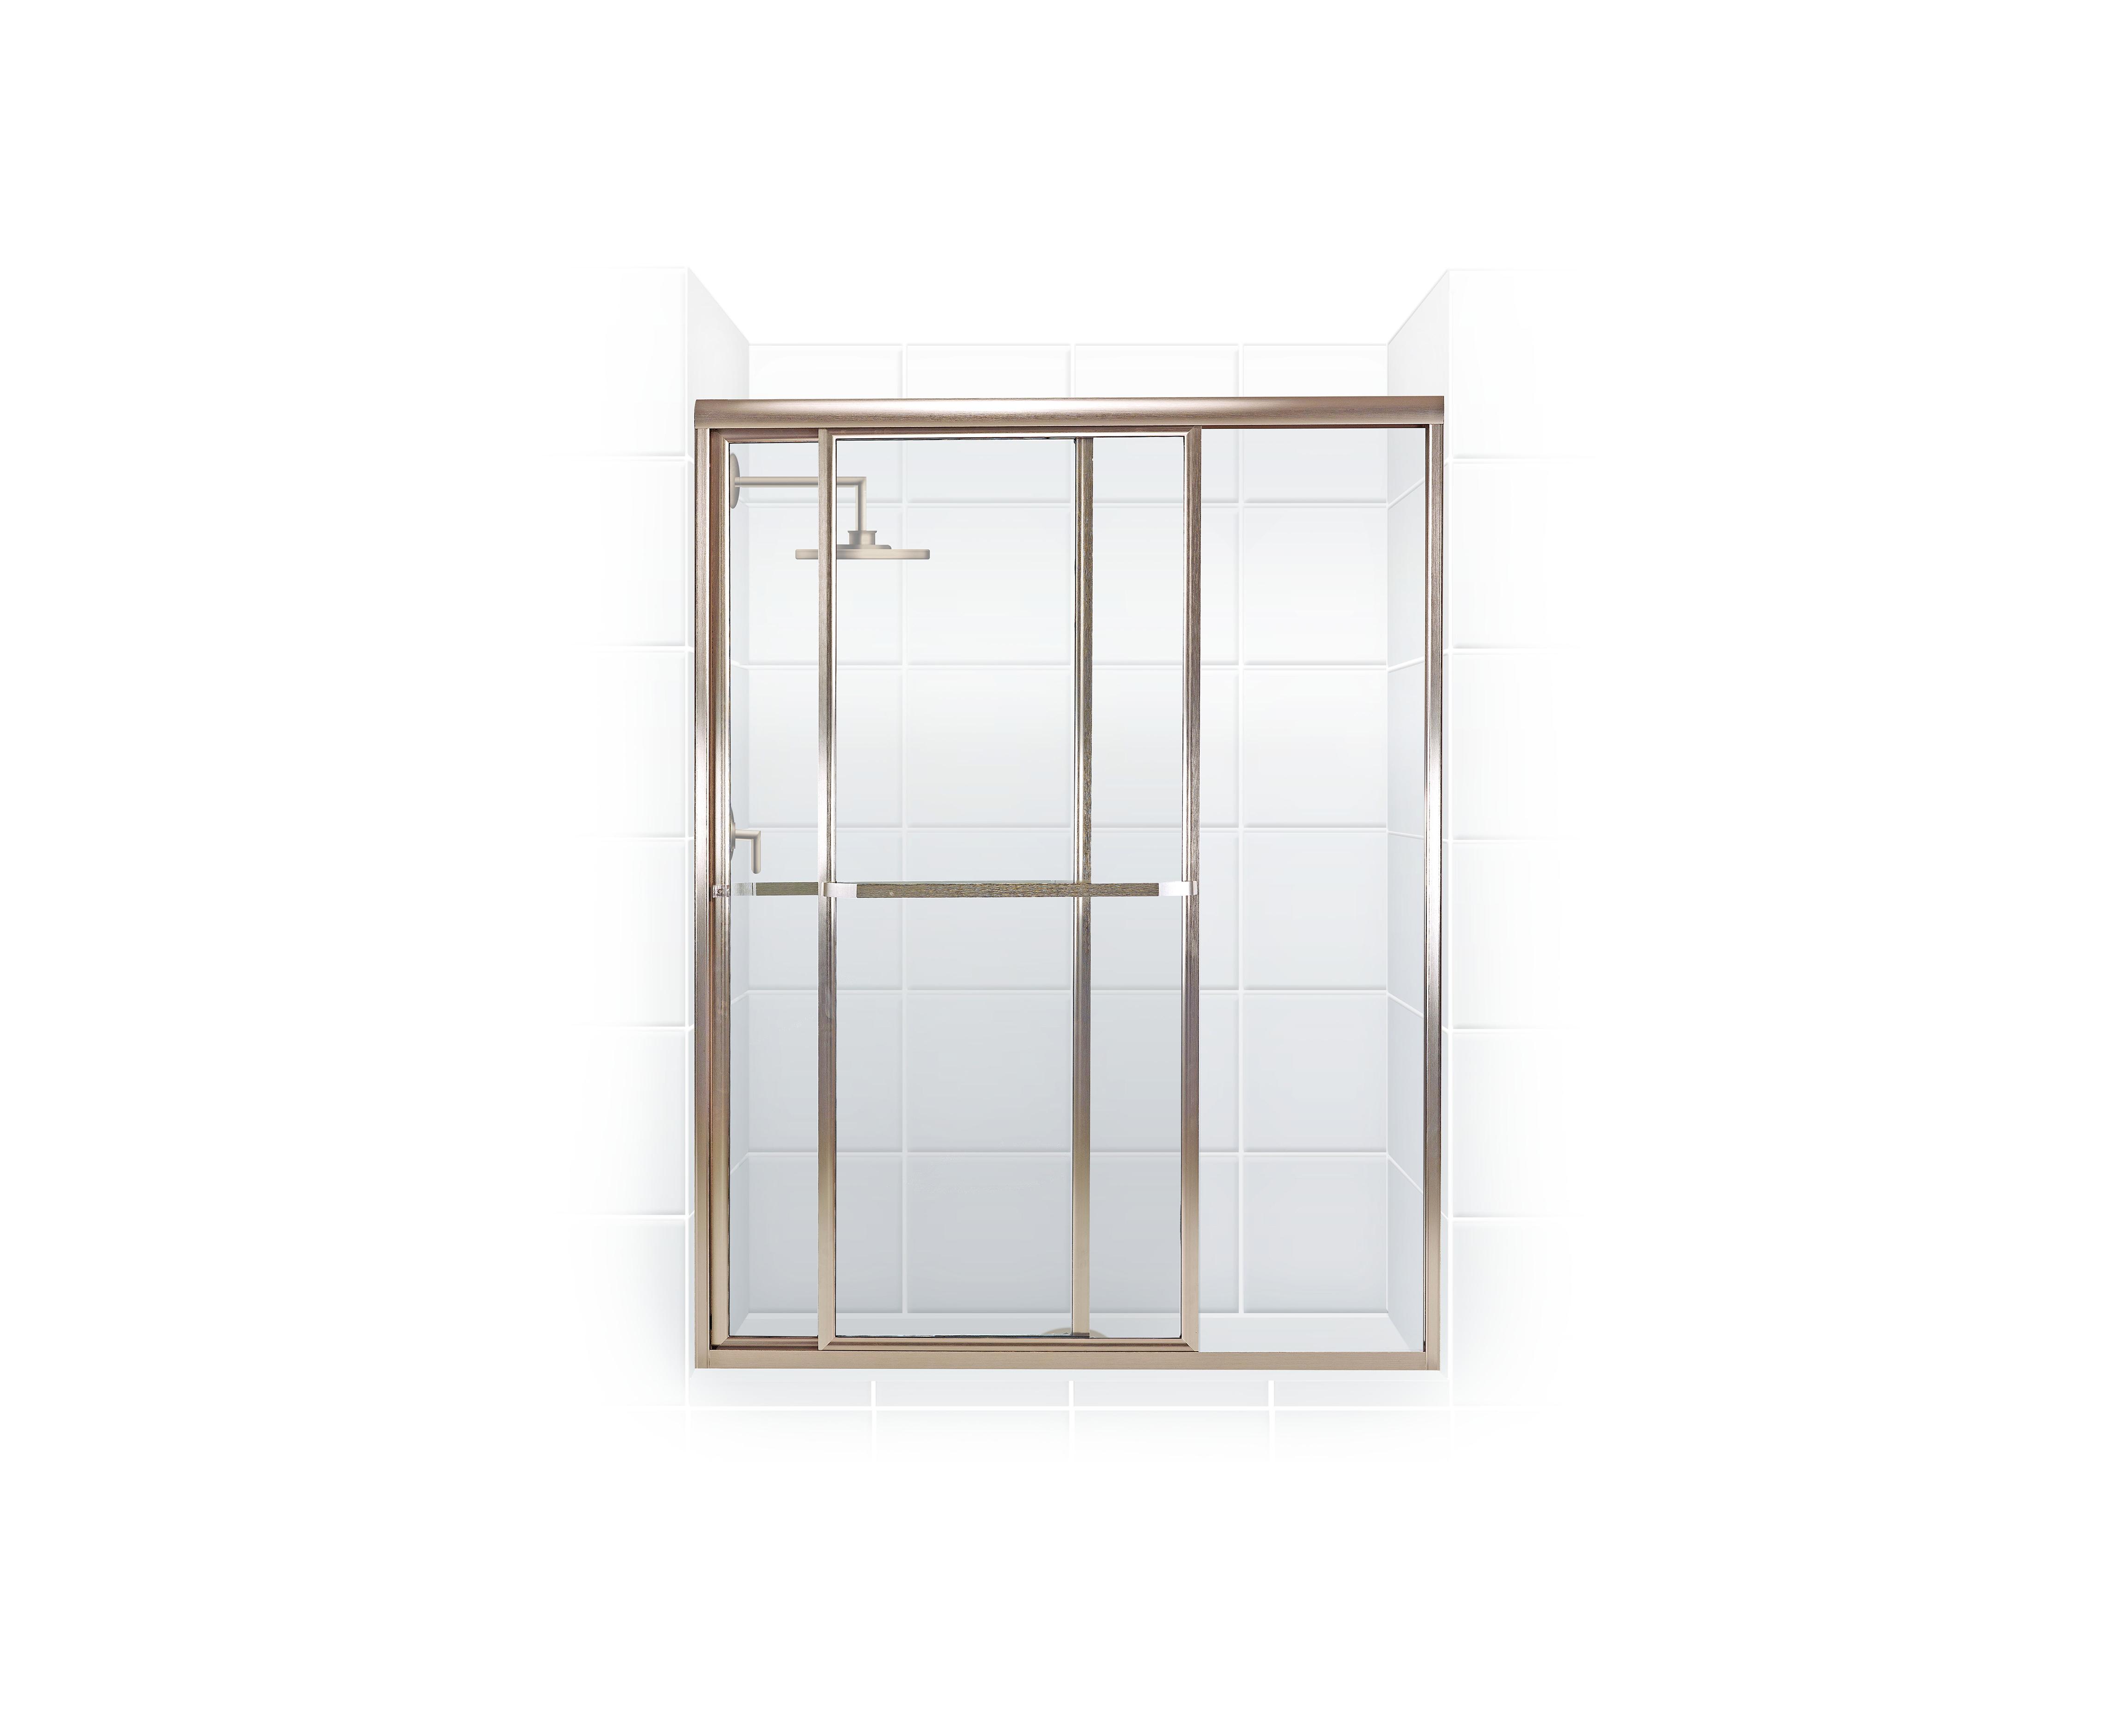 coastal industries paragon bypass shower door